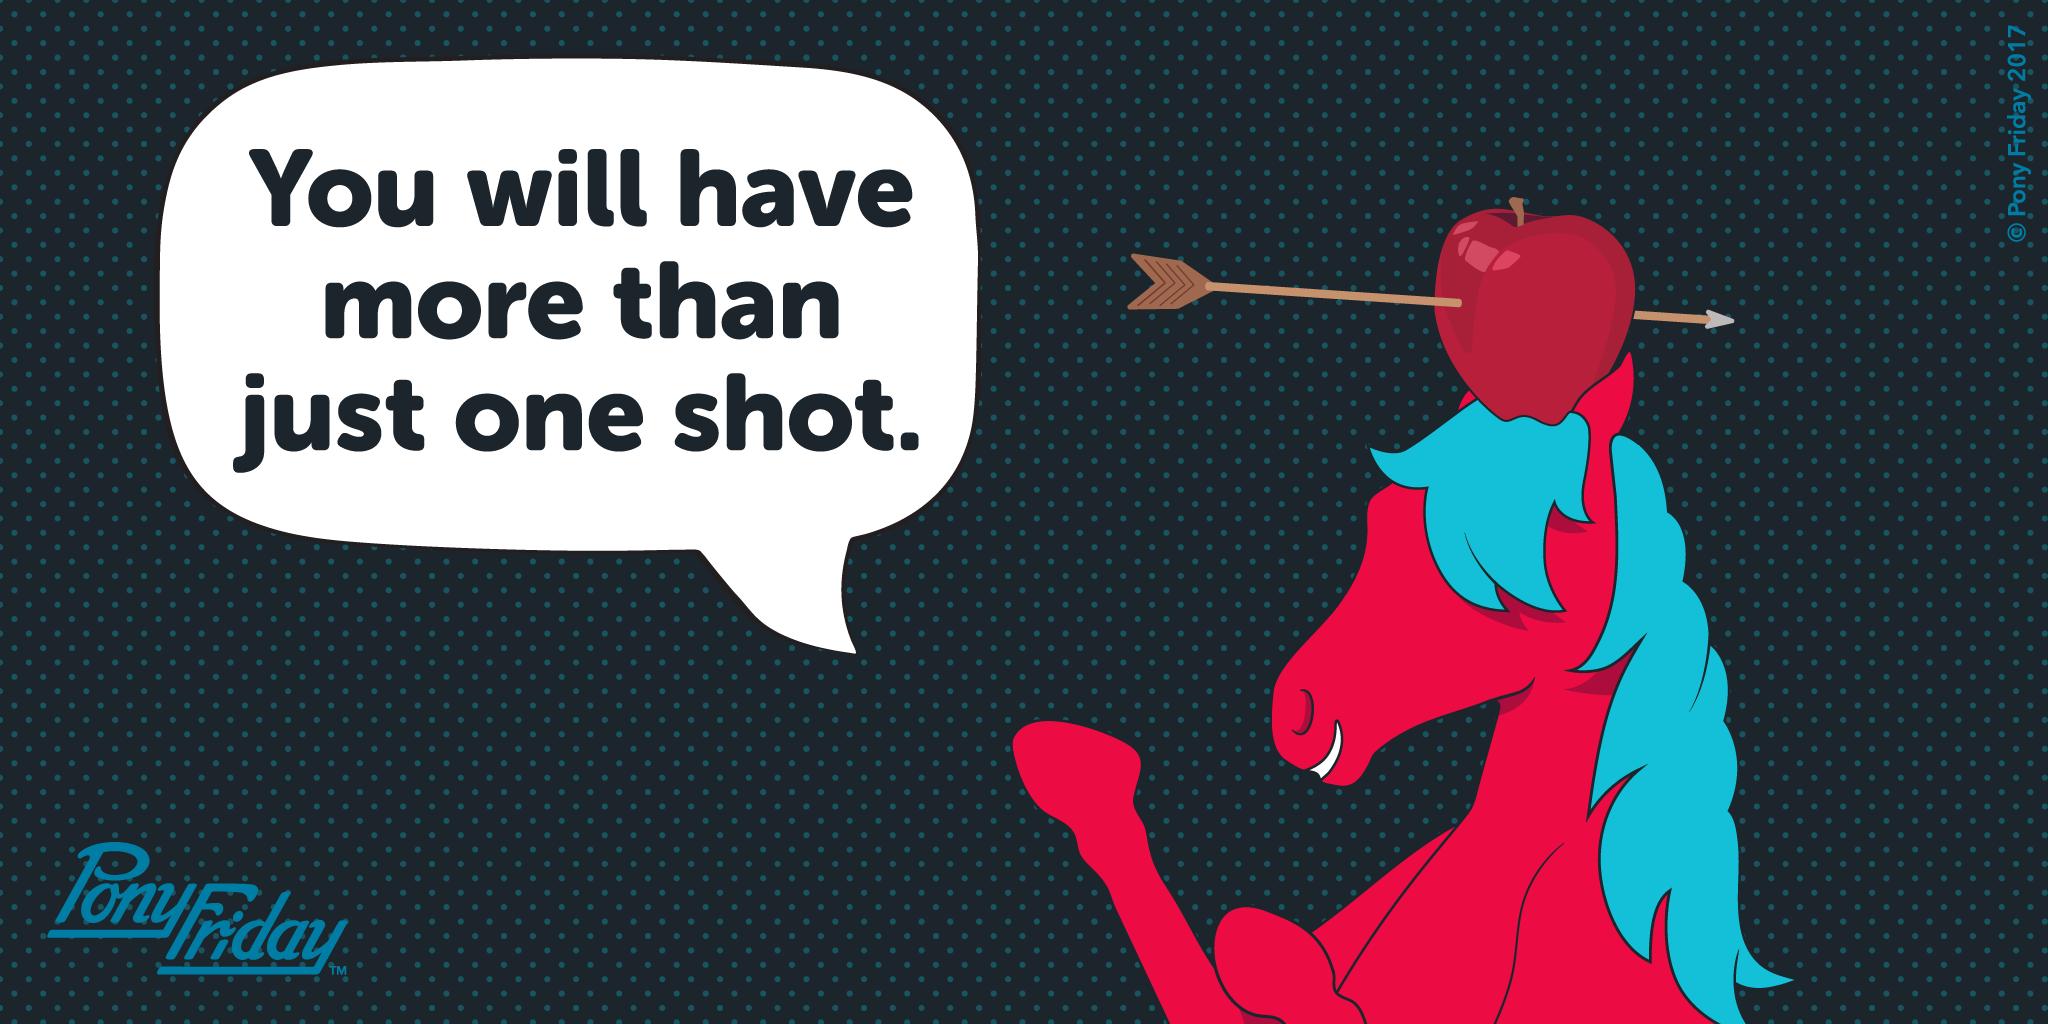 Pony-Friday-Apple-Arrow-Kicks-Blog-Header-Image.png